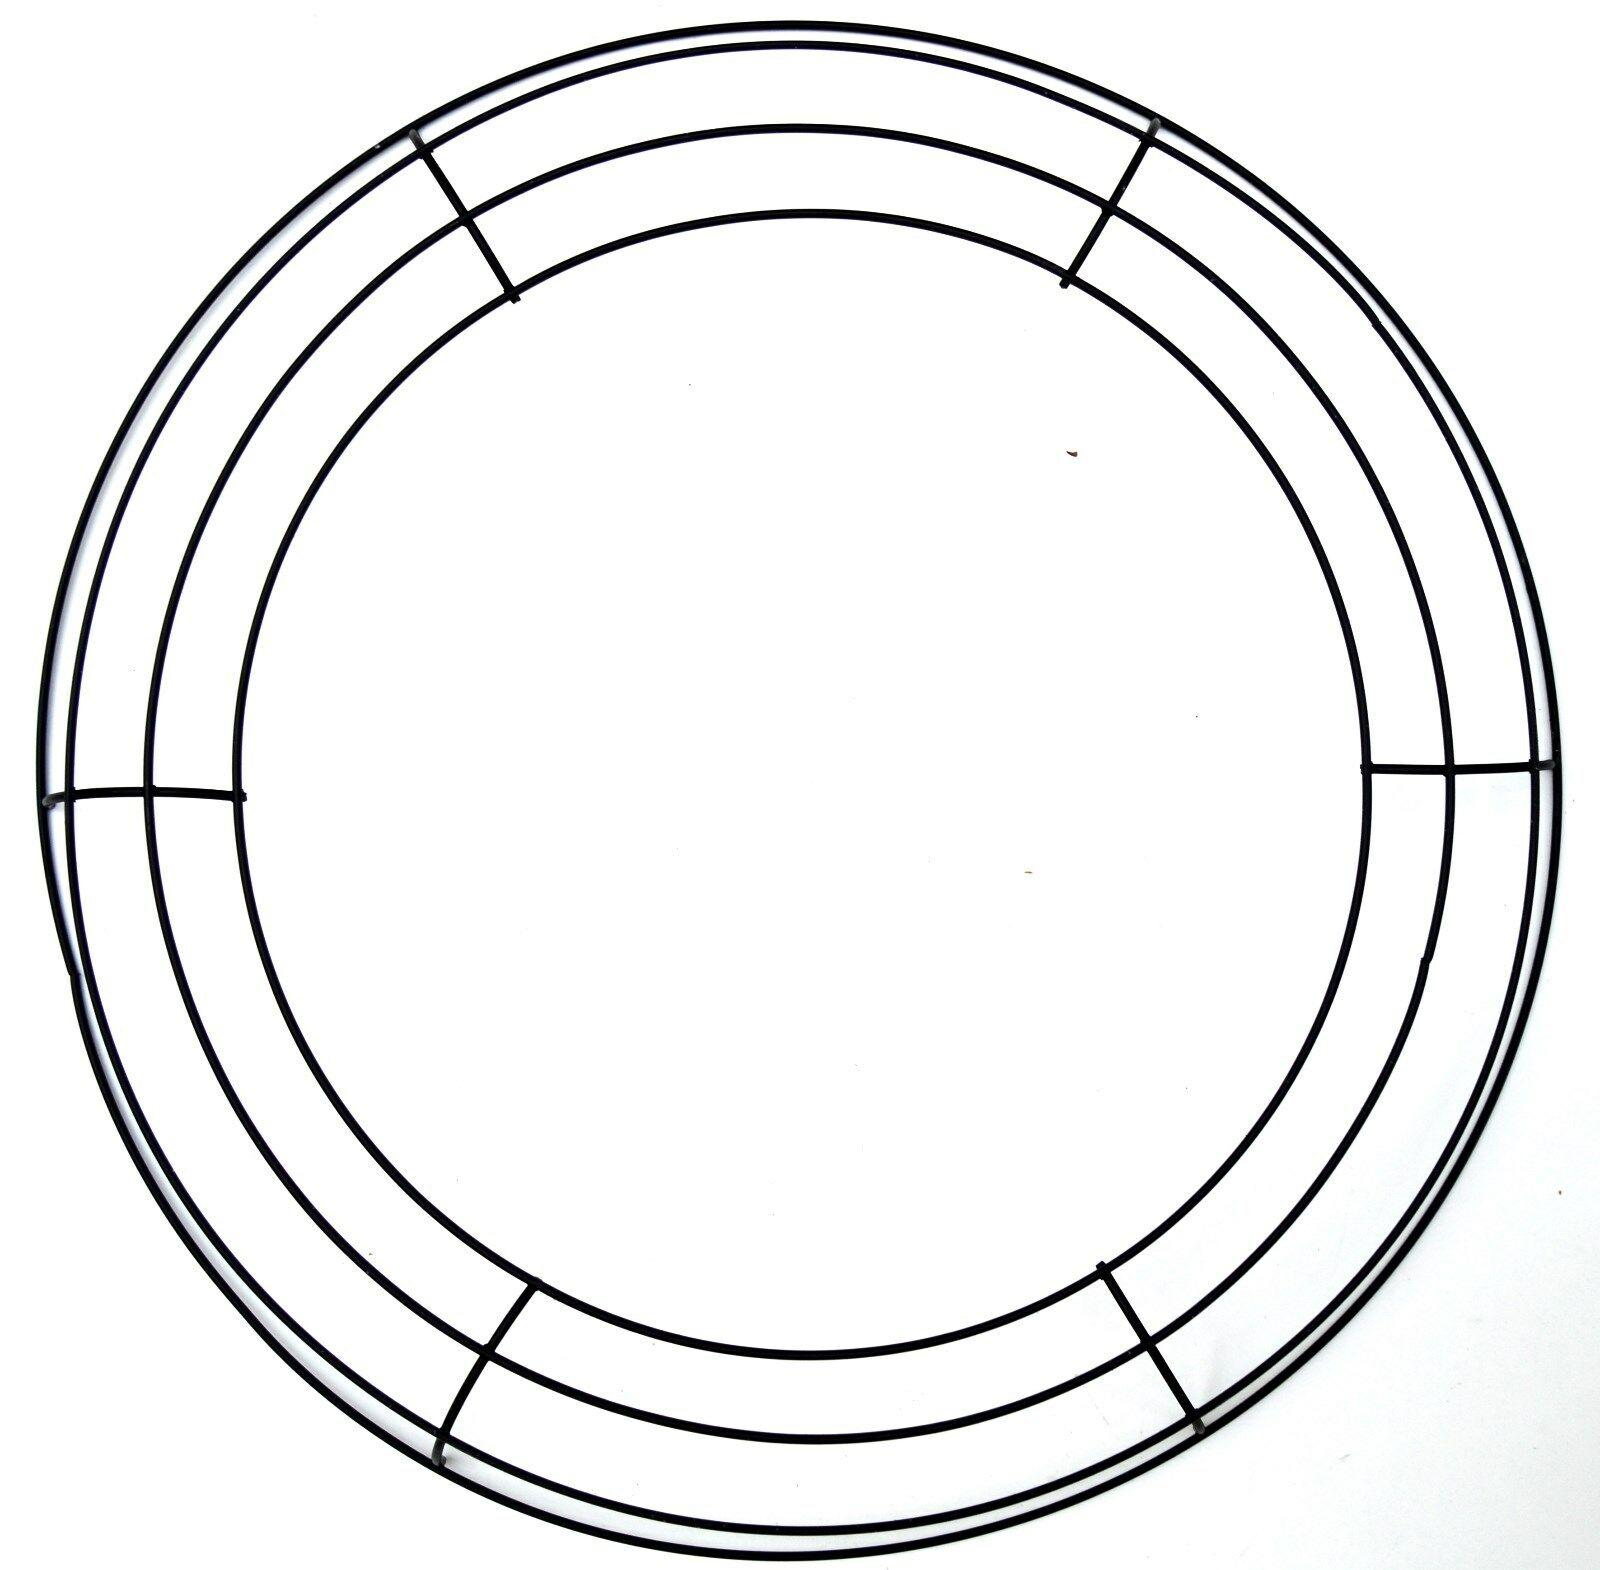 hopkins 7 blade wiring diagram vt 8540  wiring diagram for kes schematic wiring  wiring diagram for kes schematic wiring